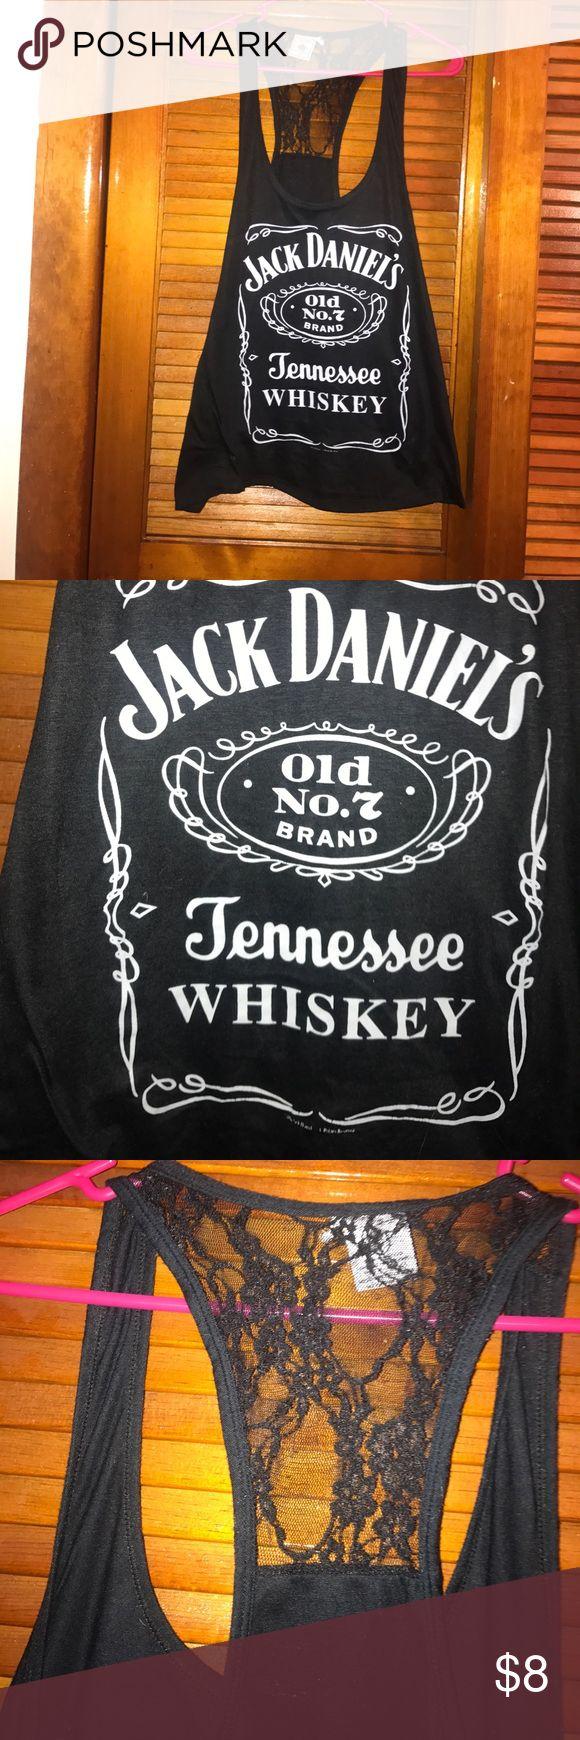 Medium Jack Daniels lace back tank top Size medium black jack Daniels classic logo tank top with upper lace back Tops Tank Tops